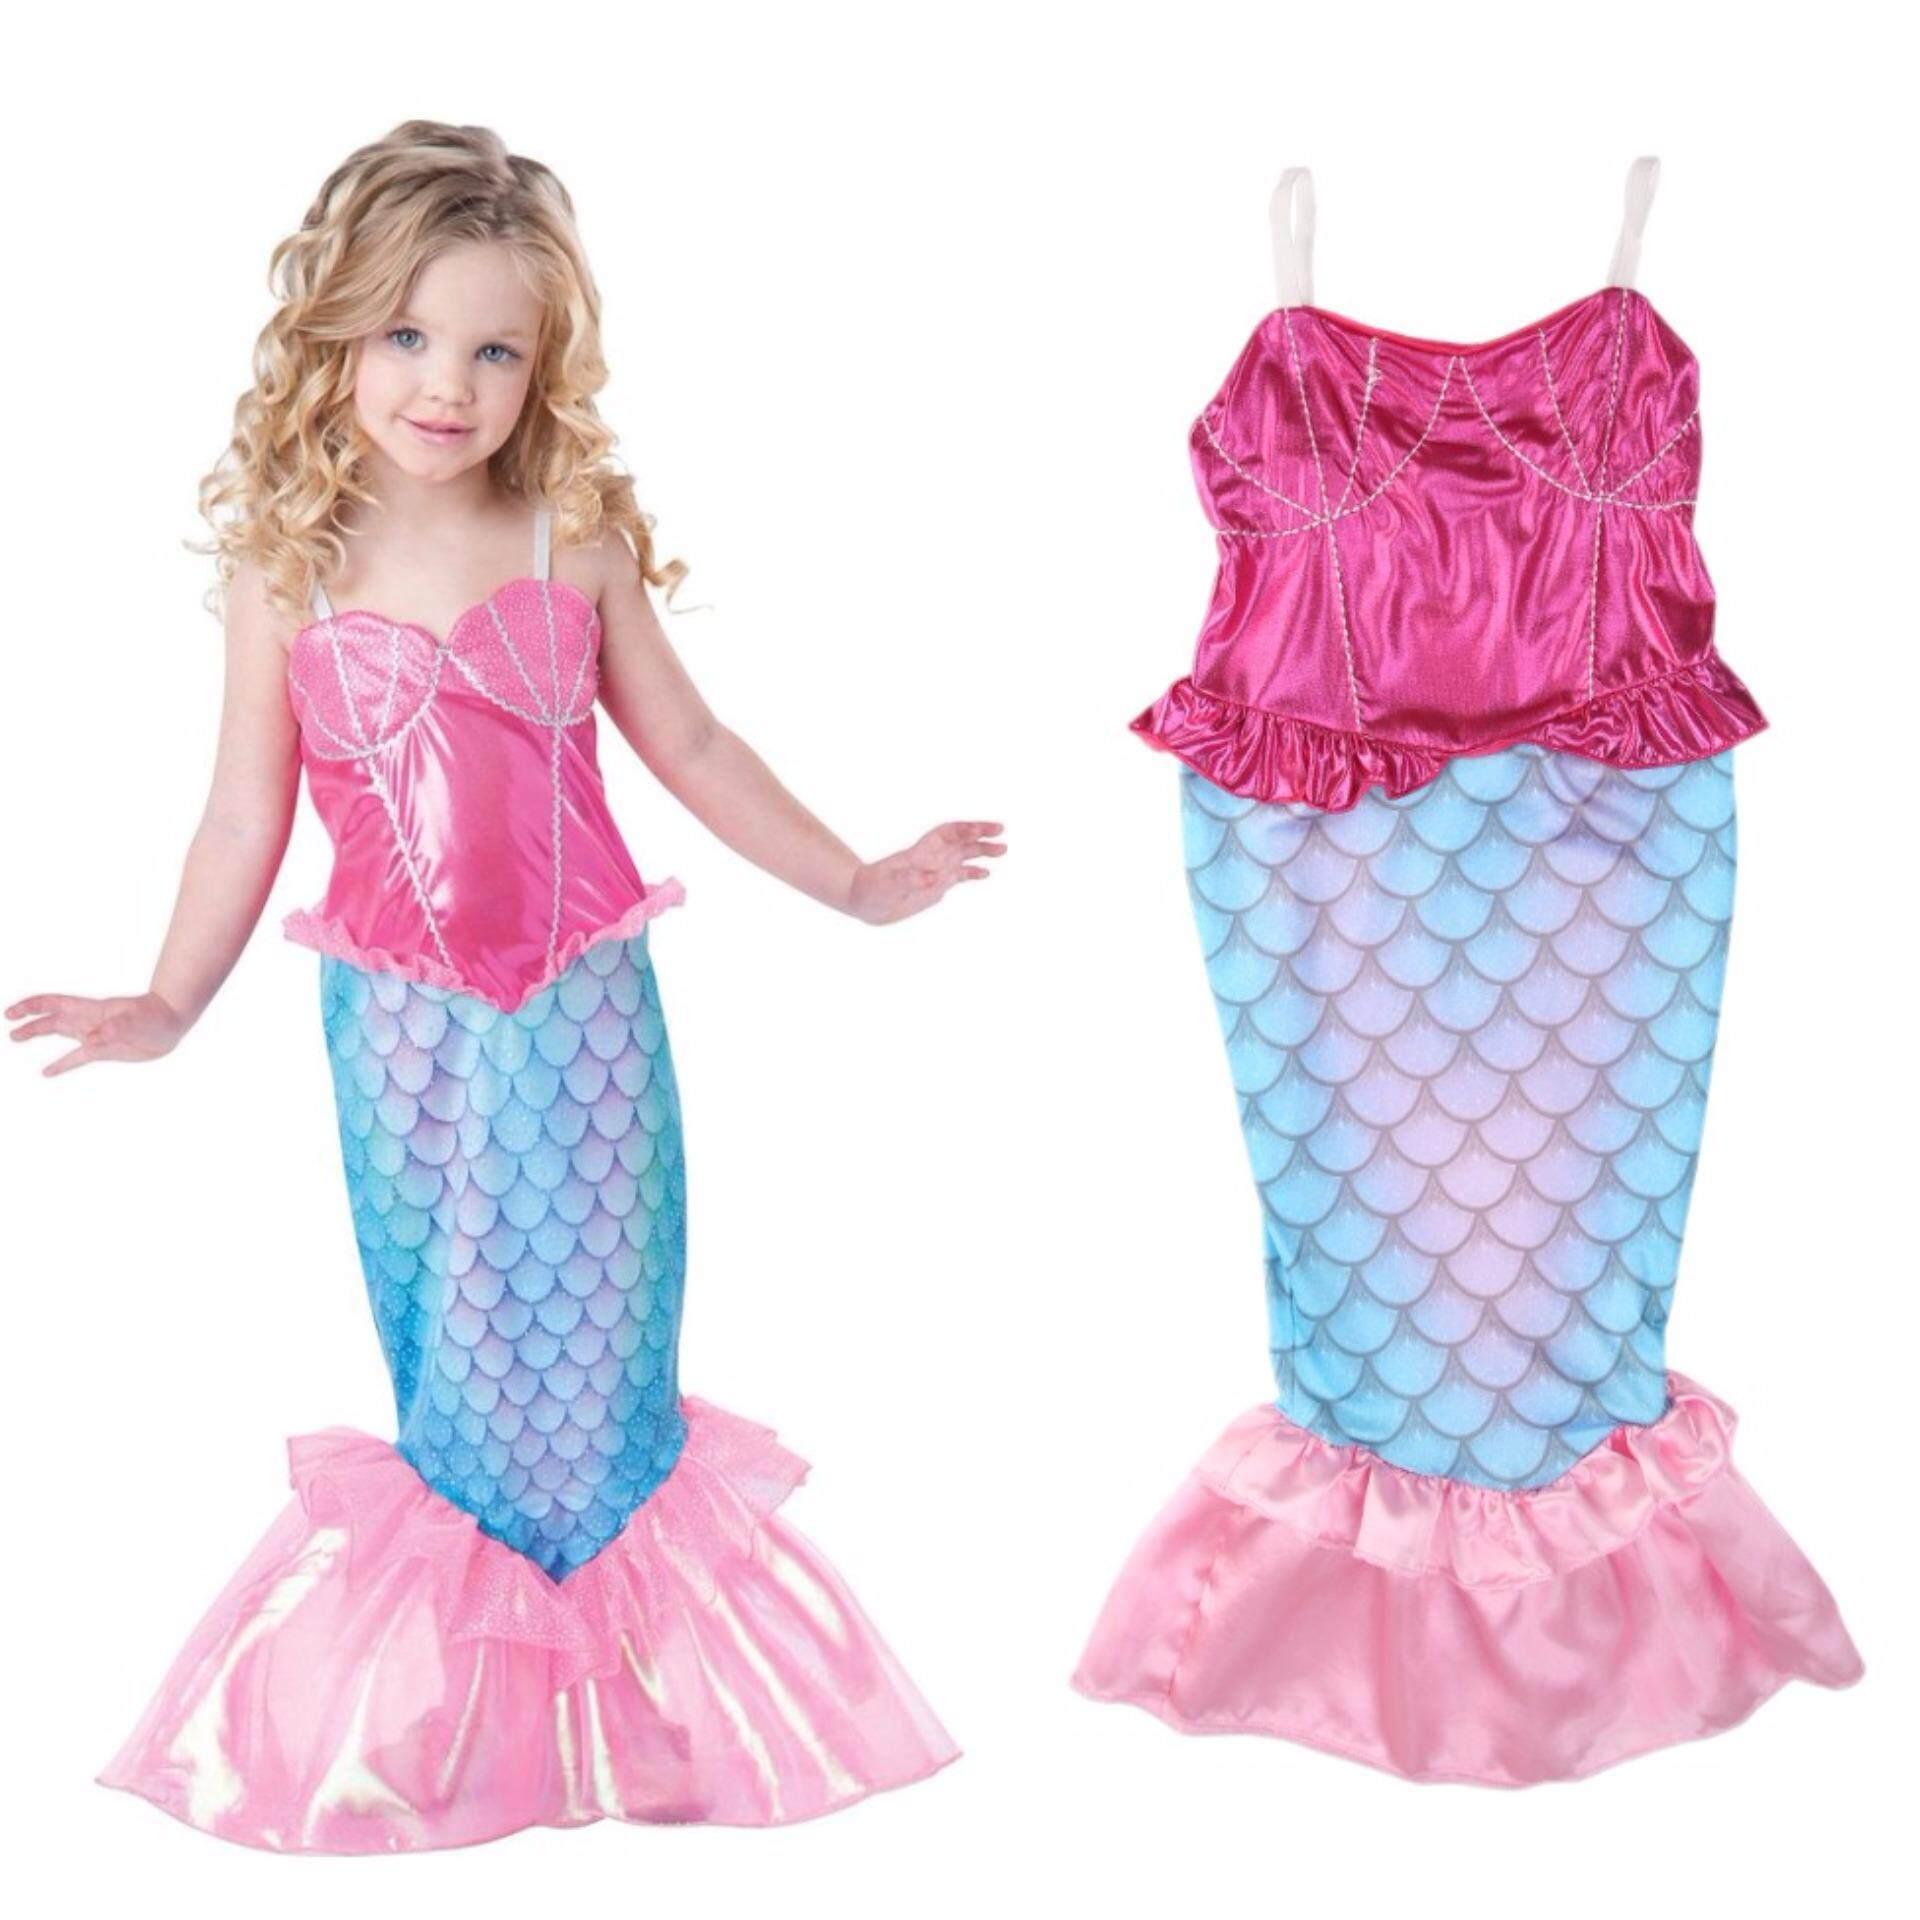 Hot Girl Kids Swimmable Mermaid Tail Bikini Swimsuit Swimming Costume Malaysia  sc 1 st  Lingerie Malaysia & Hot Girl Kids Swimmable Mermaid Tail Bikini Swimsuit Swimming ...